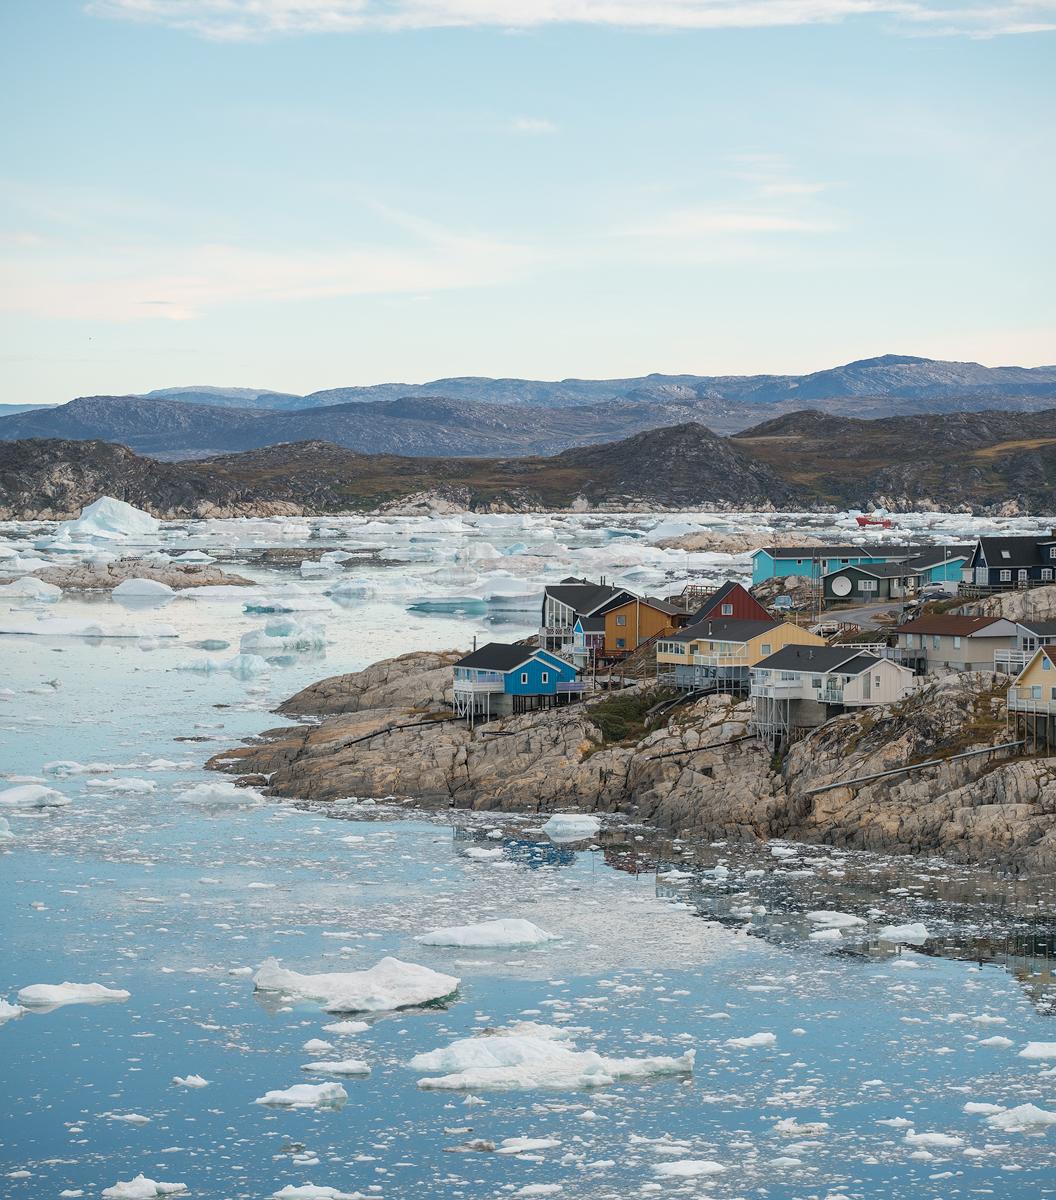 Ilulissat - Scenic houses of Greenland's third largest town Ilulissat